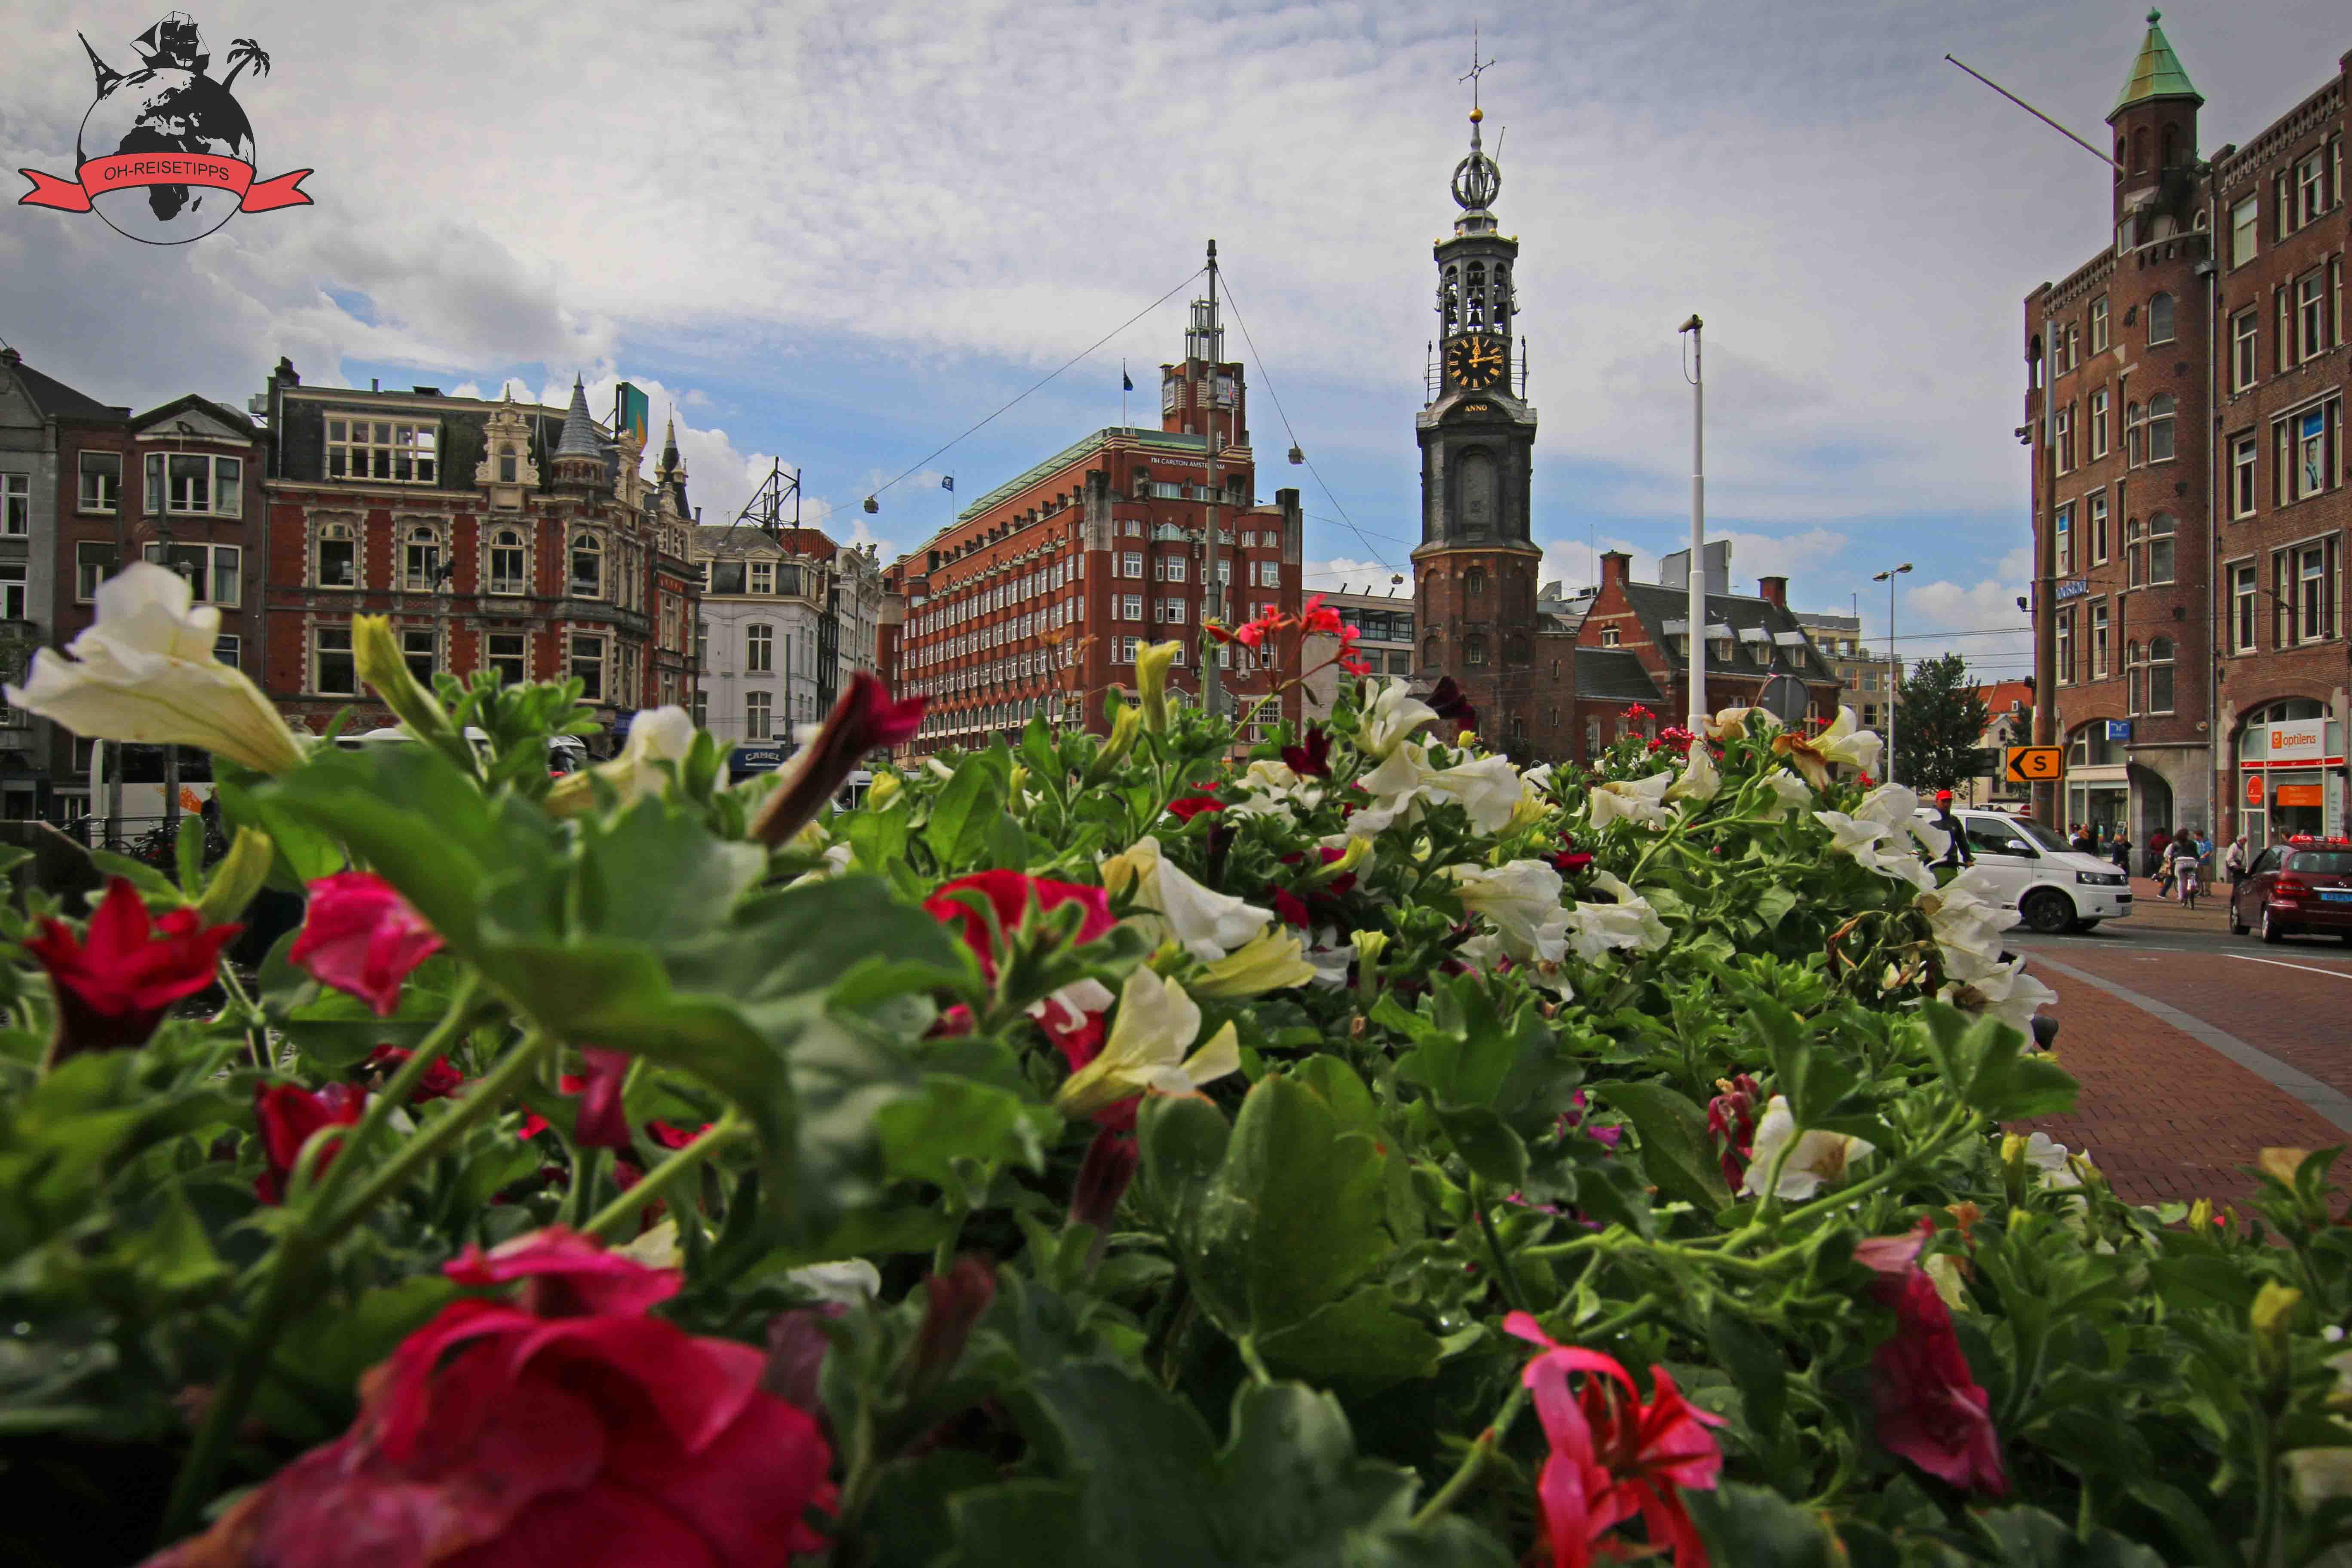 niederlande-amsterdam-bloemenmarkt